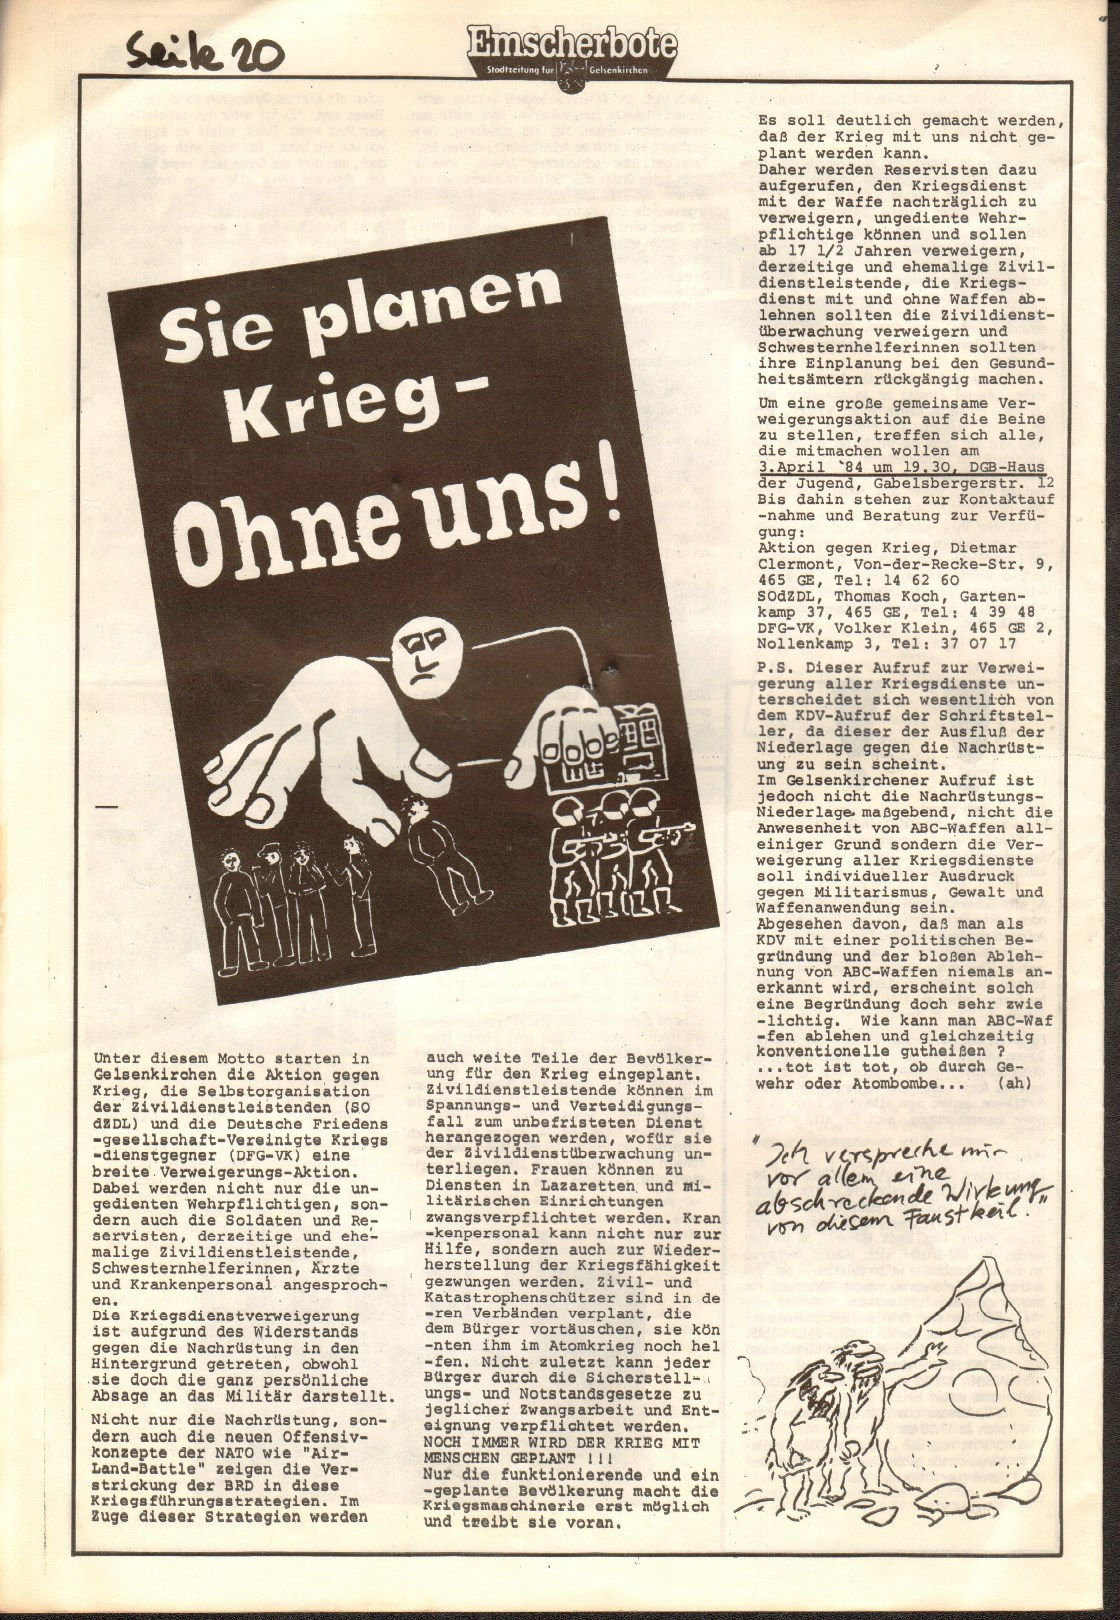 Gelsenkirchen_Emscherbote_1984_37_20